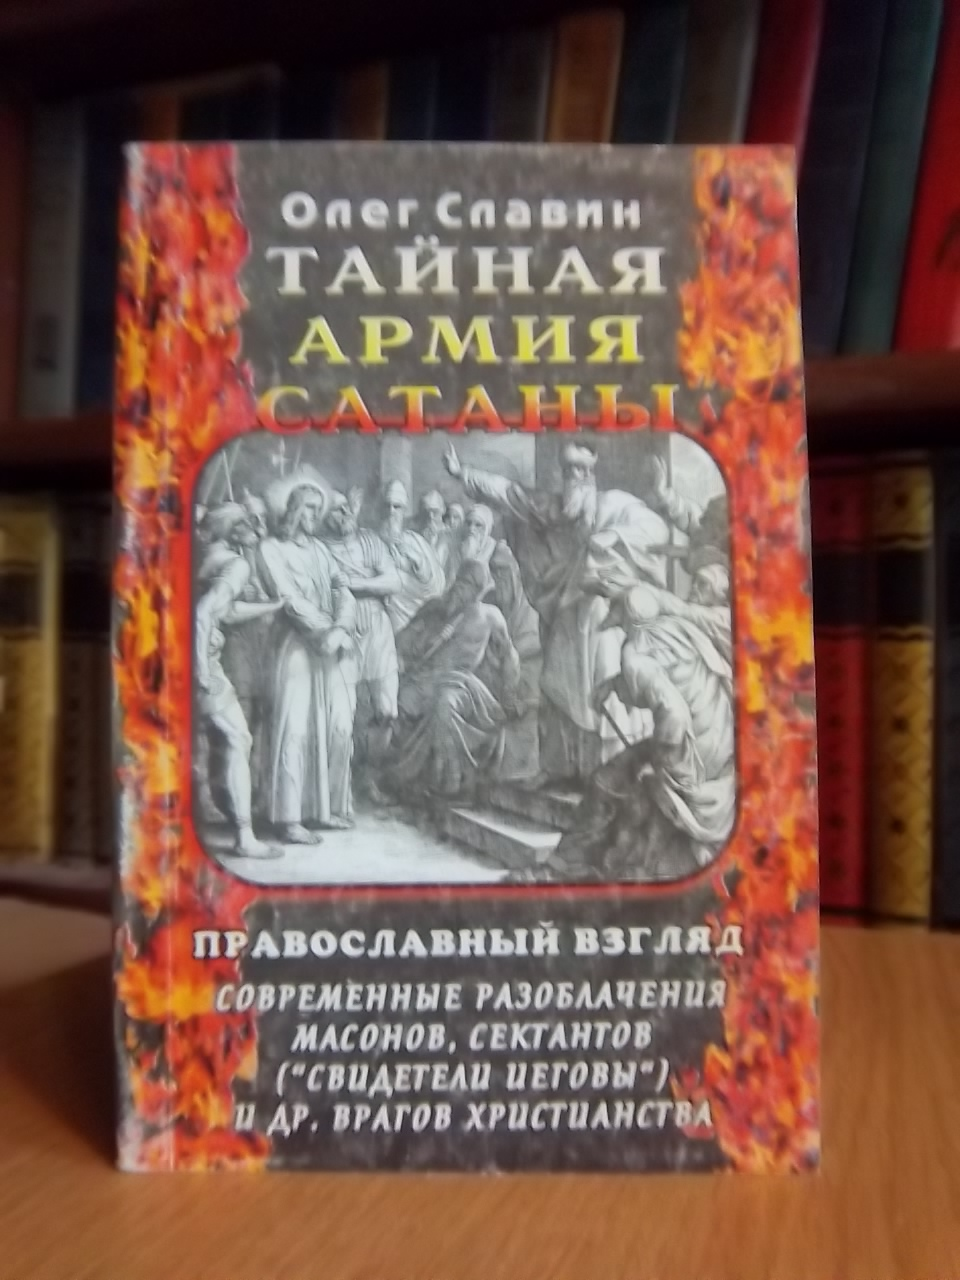 Тайная армия сатаны Православный взгляд